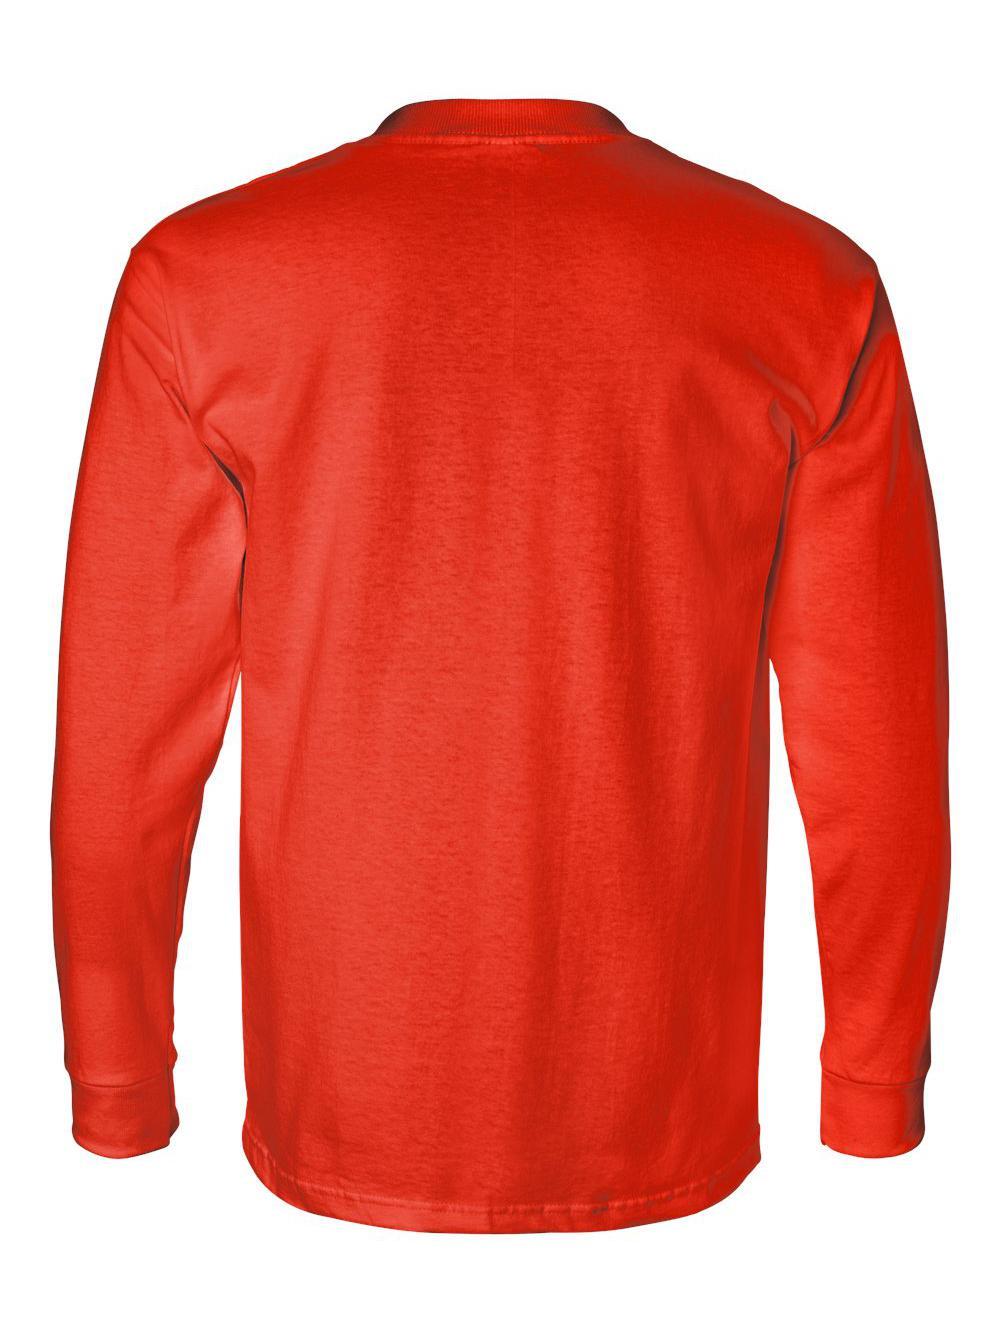 Bayside-USA-Made-Long-Sleeve-T-Shirt-with-a-Pocket-8100 thumbnail 19